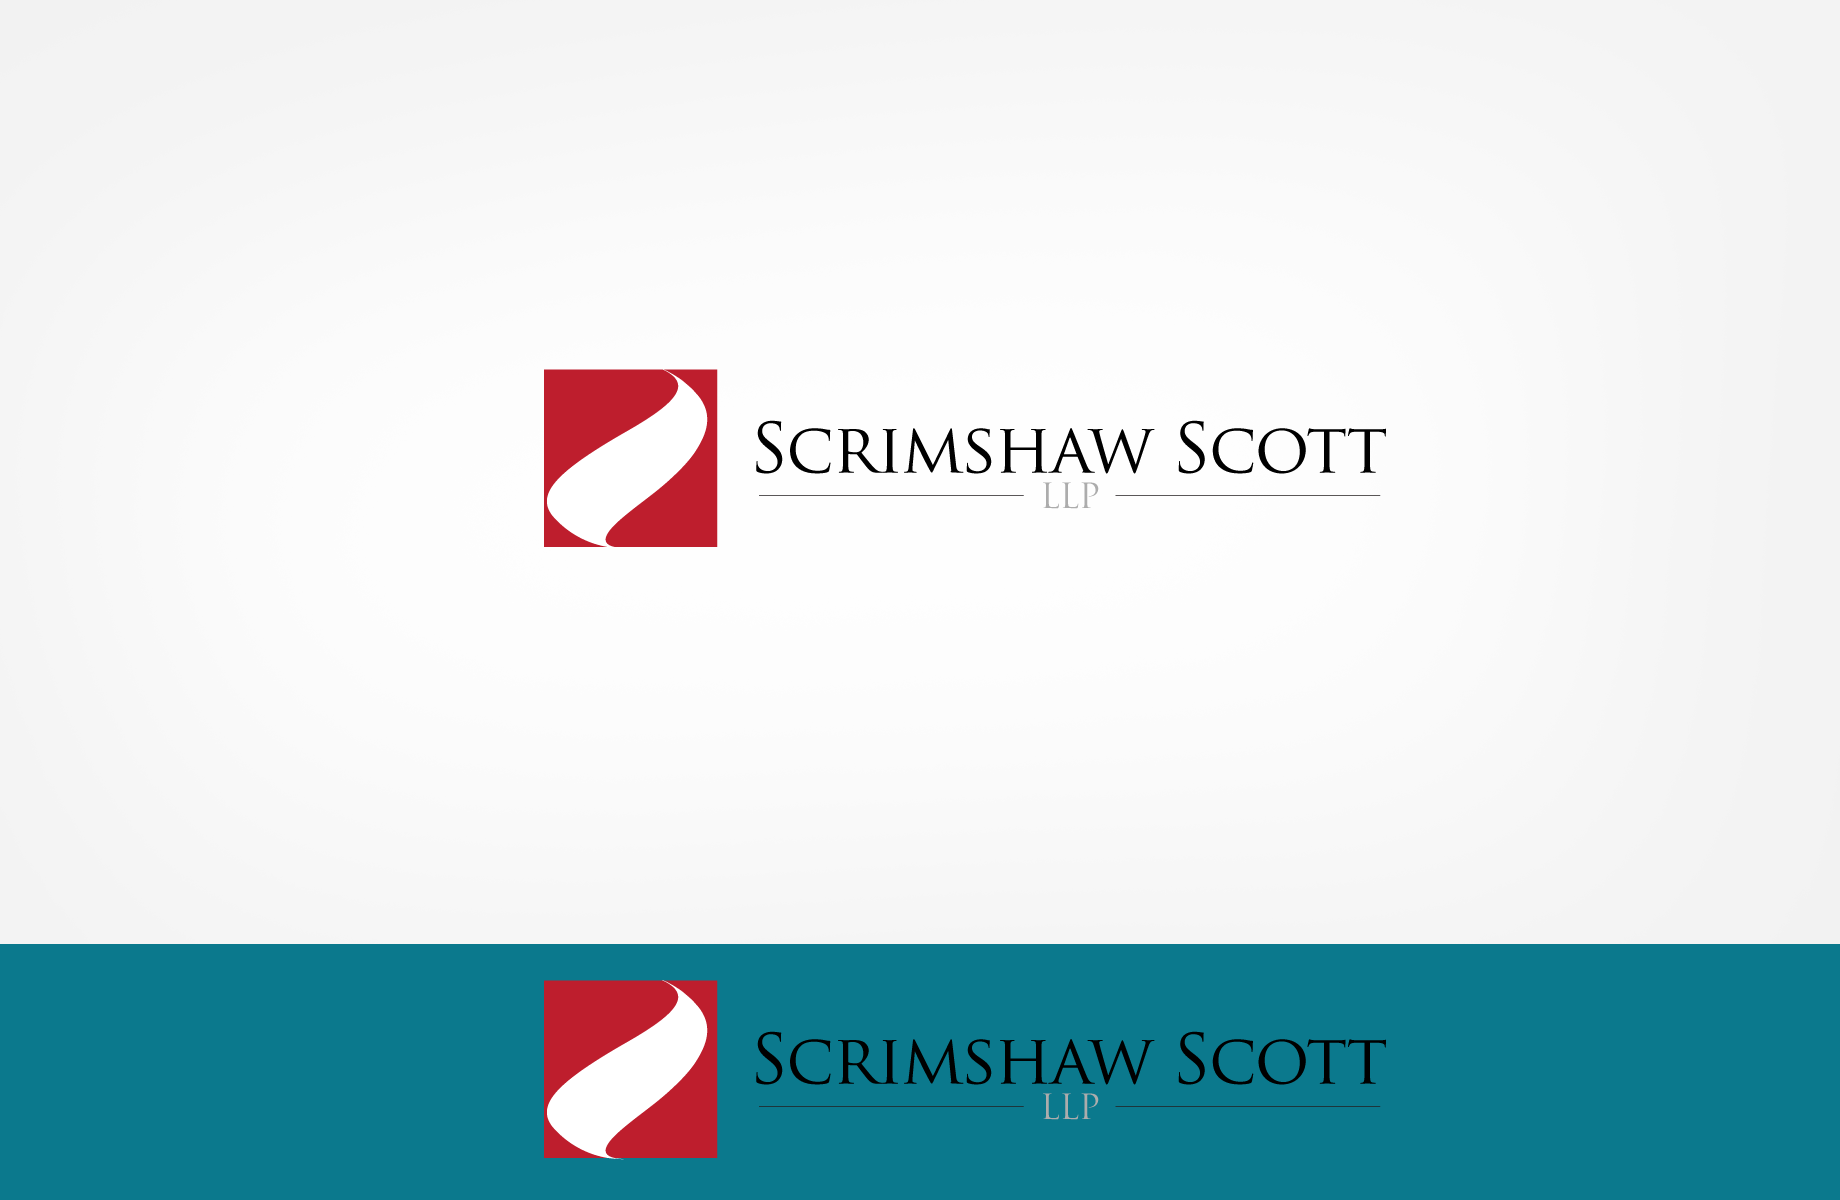 Logo Design by Jan Chua - Entry No. 79 in the Logo Design Contest Creative Logo Design for Scrimshaw Scott LLP.